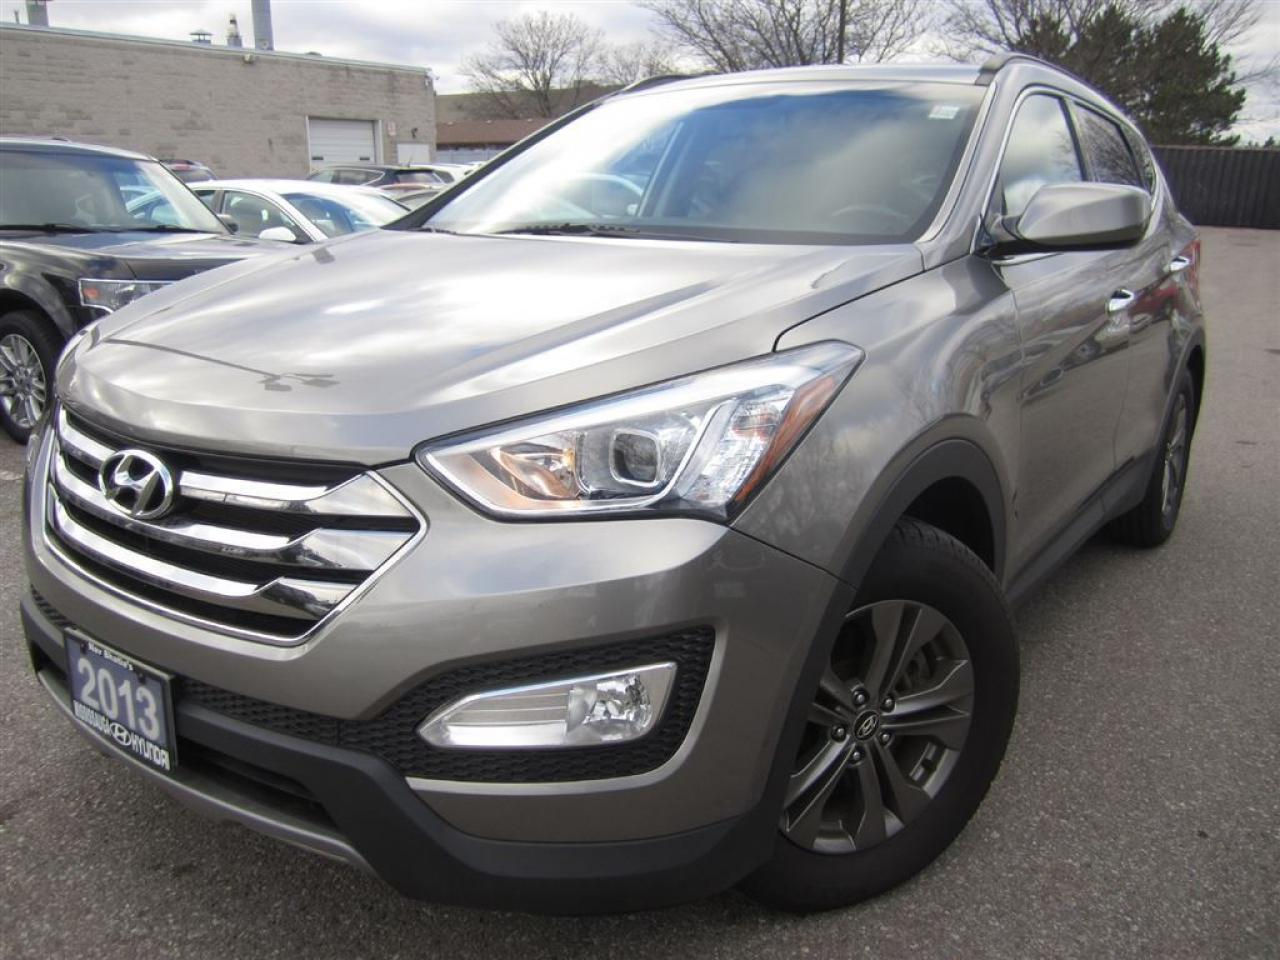 Photo of Grey 2013 Hyundai Santa Fe